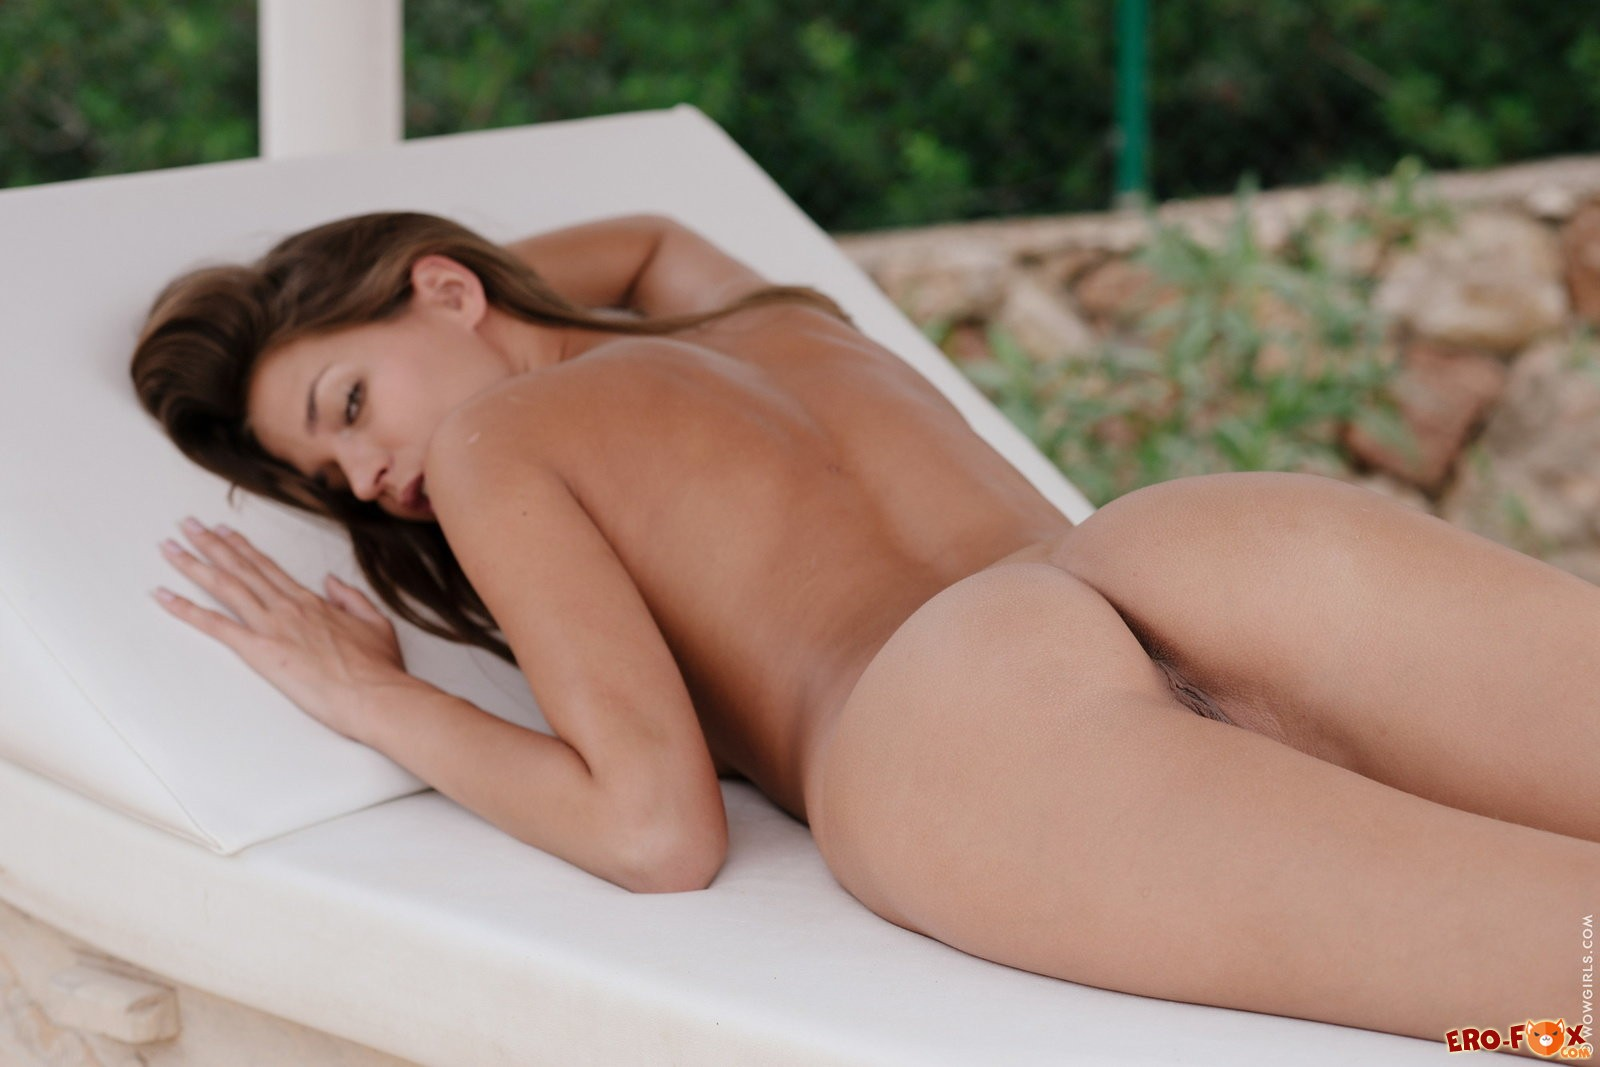 Сексуальная красотка разделась до гола .